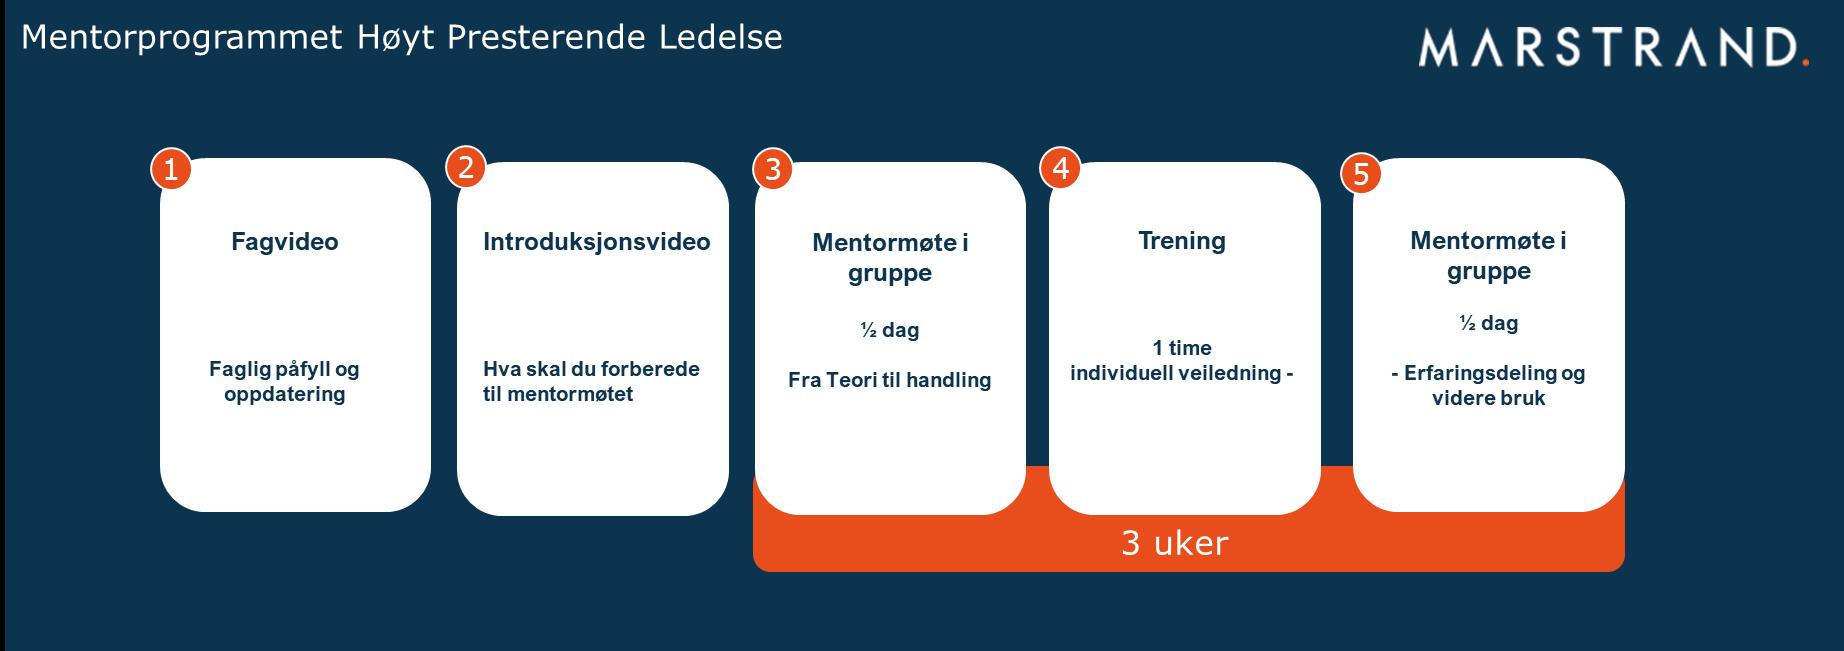 Mentorprogrammet høyt presterende ledelse HPL figur modul